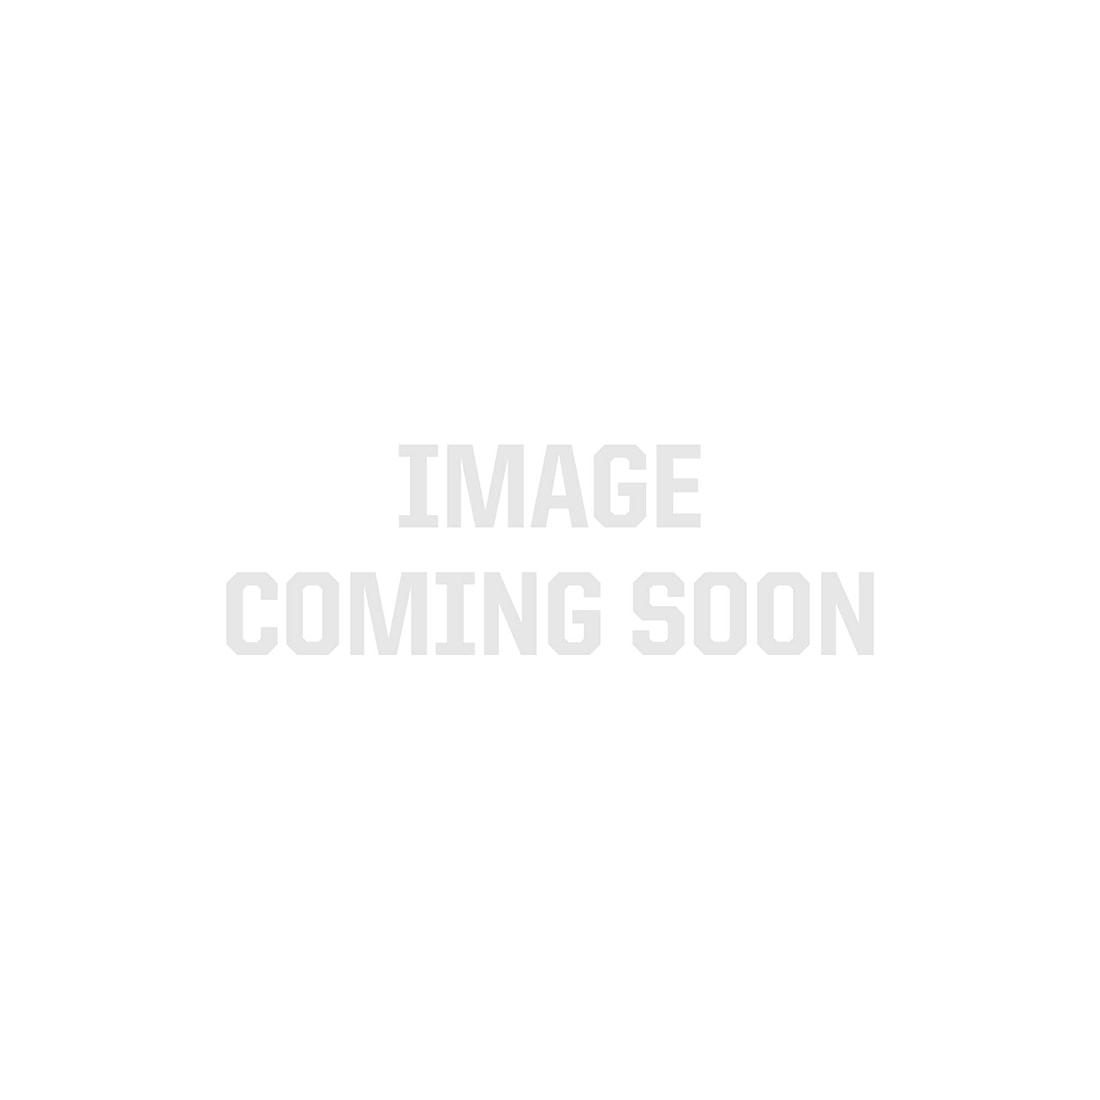 Neutral White 3014 Side View LED Strip Light, 96/m, 8mm wide, Sample Kit